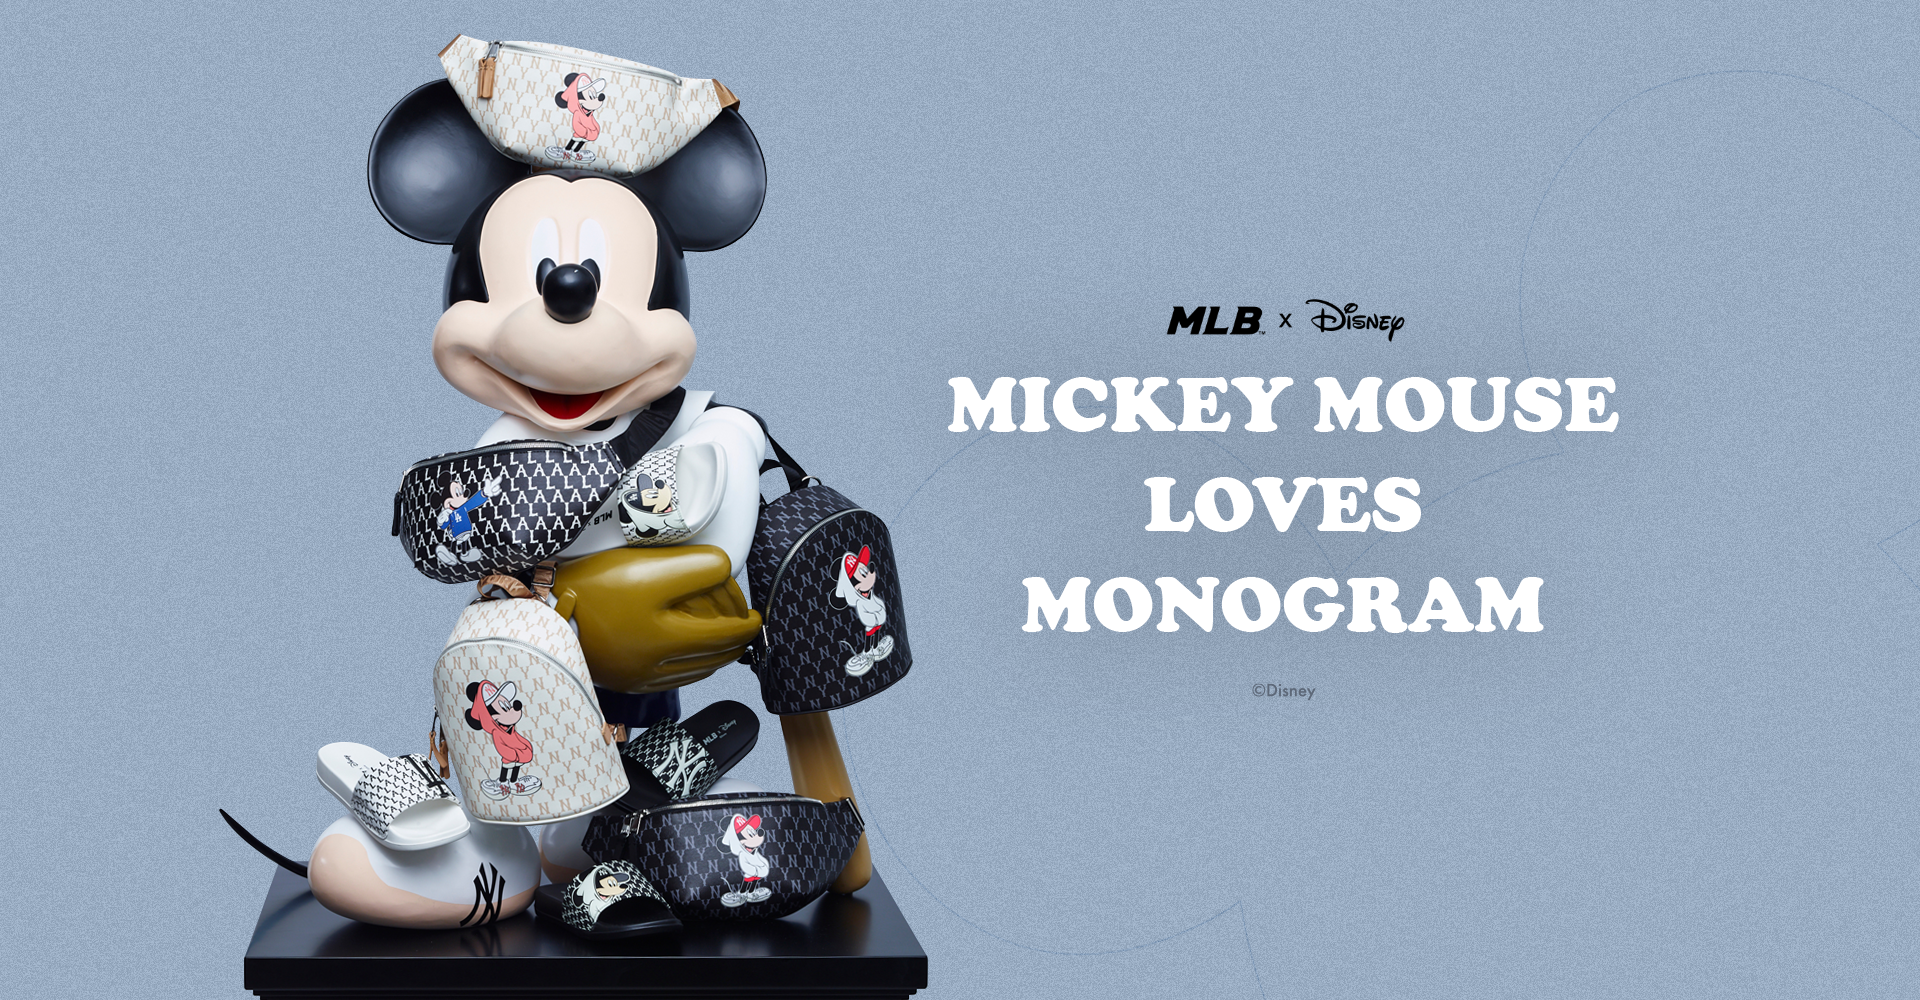 MLB X DISNEY Mickey mouse Loves Monogram